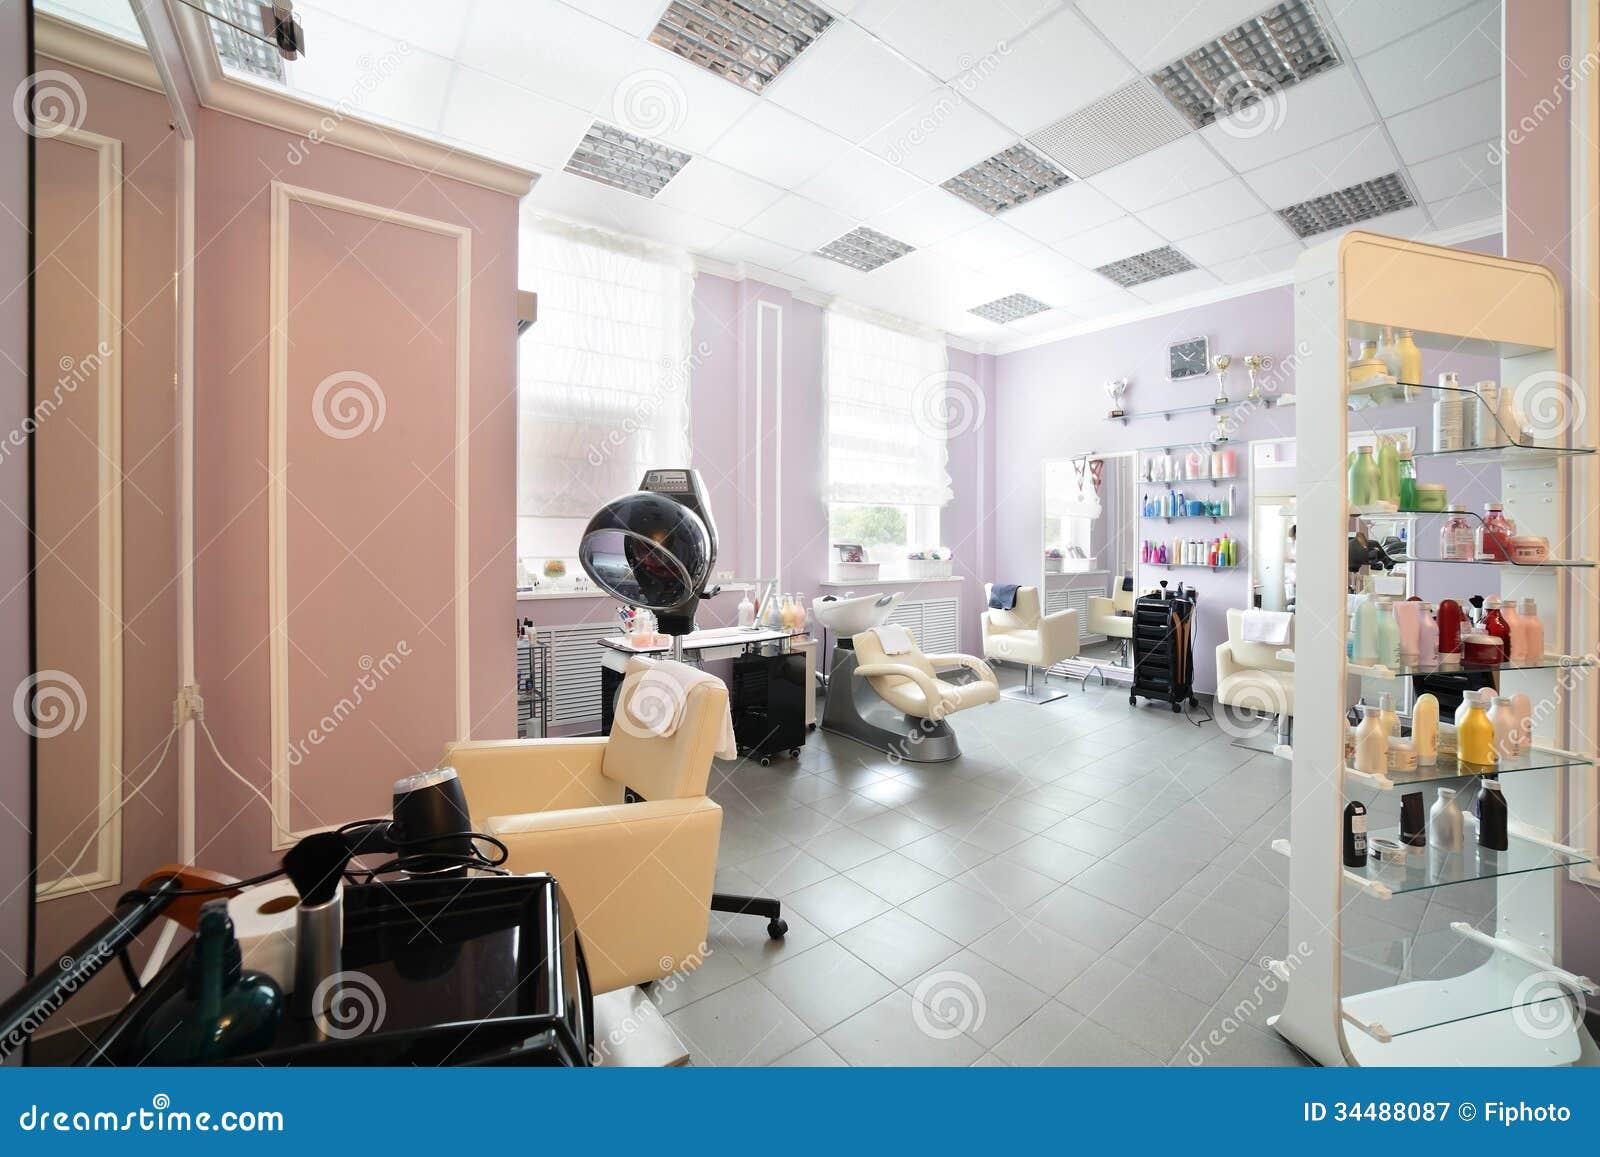 Clean european hair salon royalty free stock photography for A fresh start beauty salon